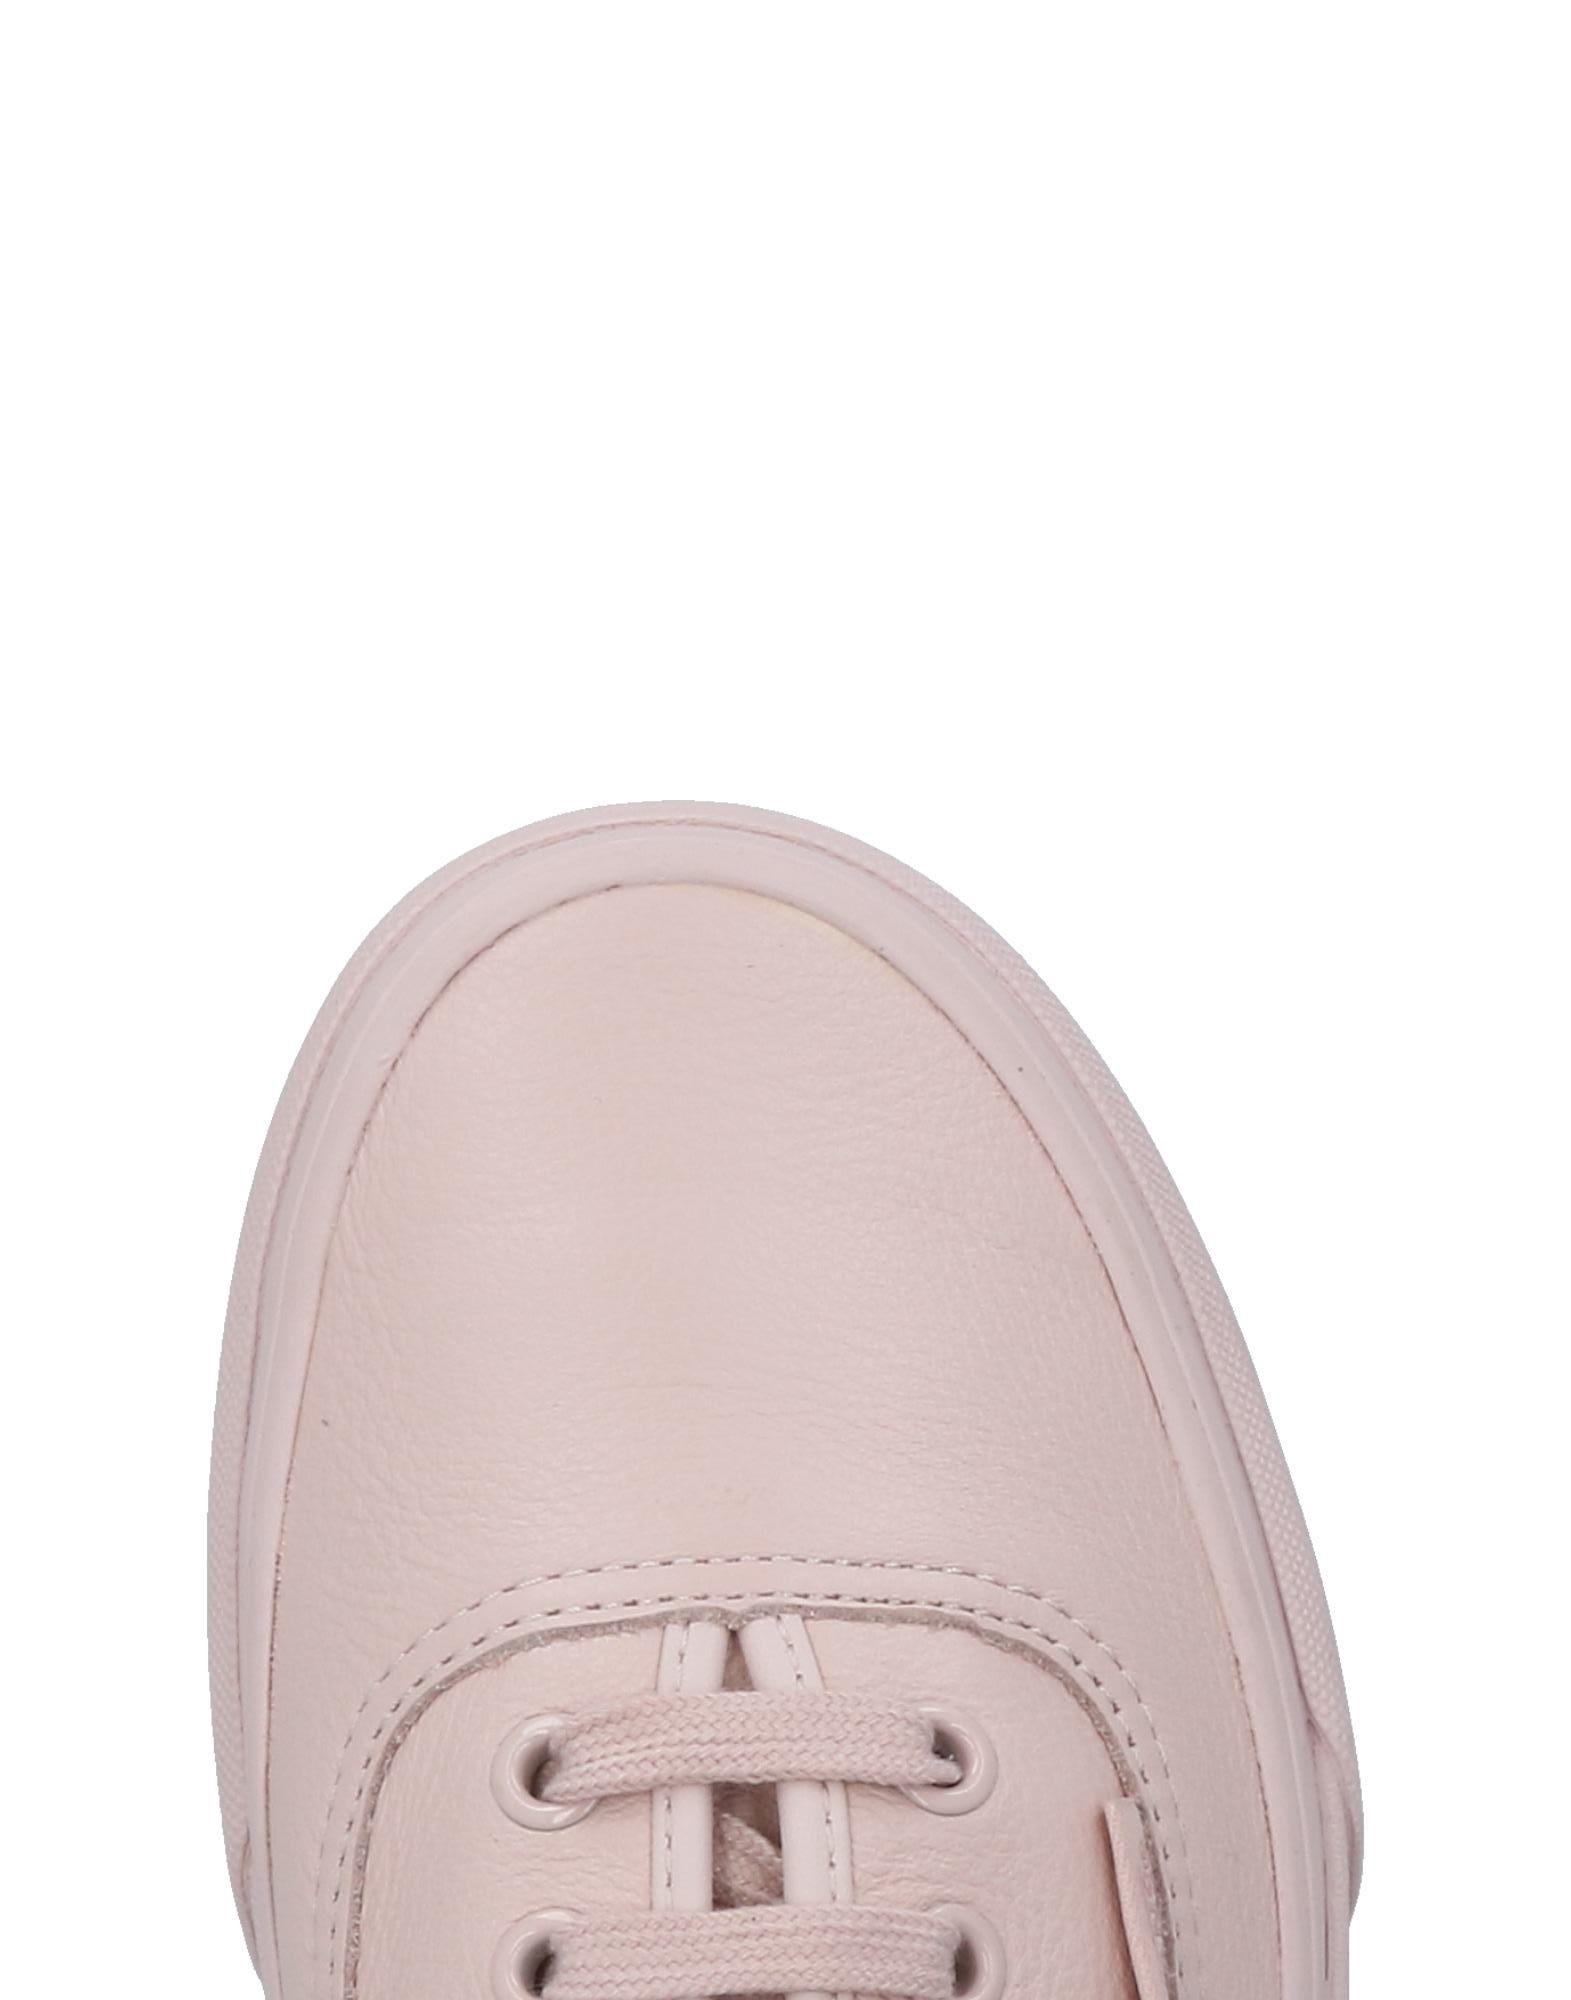 Vans Sneakers Damen   Damen 11478071SU  9a1a11